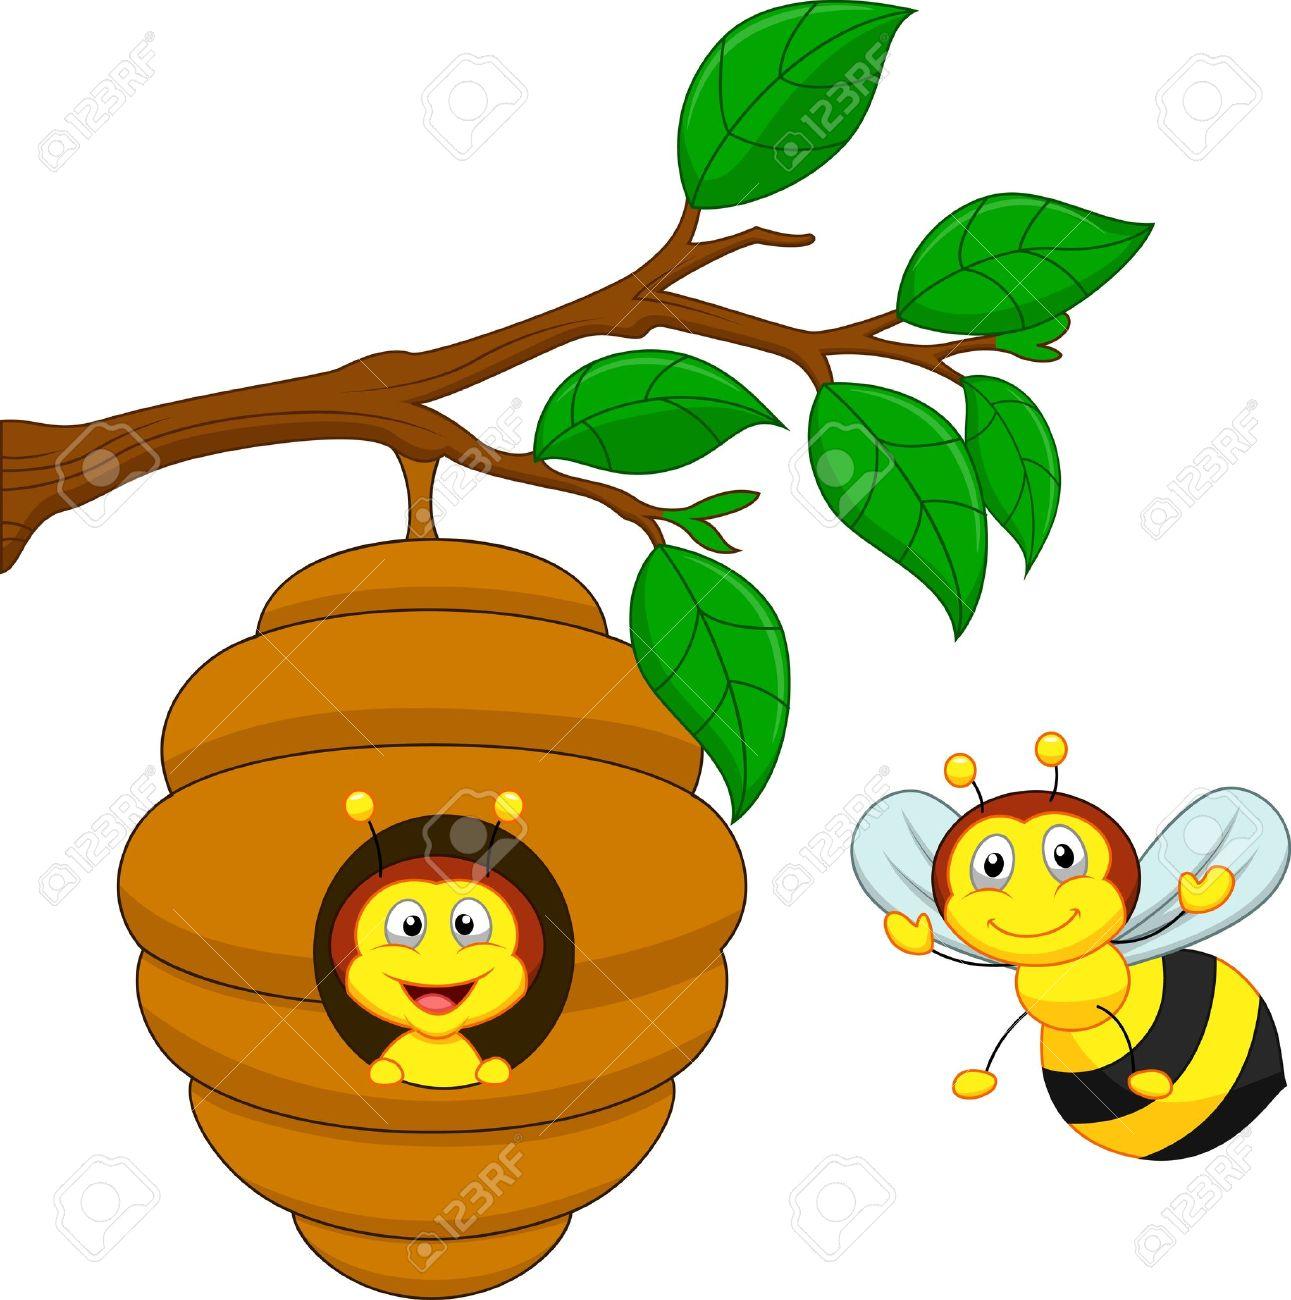 cartoon a honey bee and comb royalty free cliparts vectors and